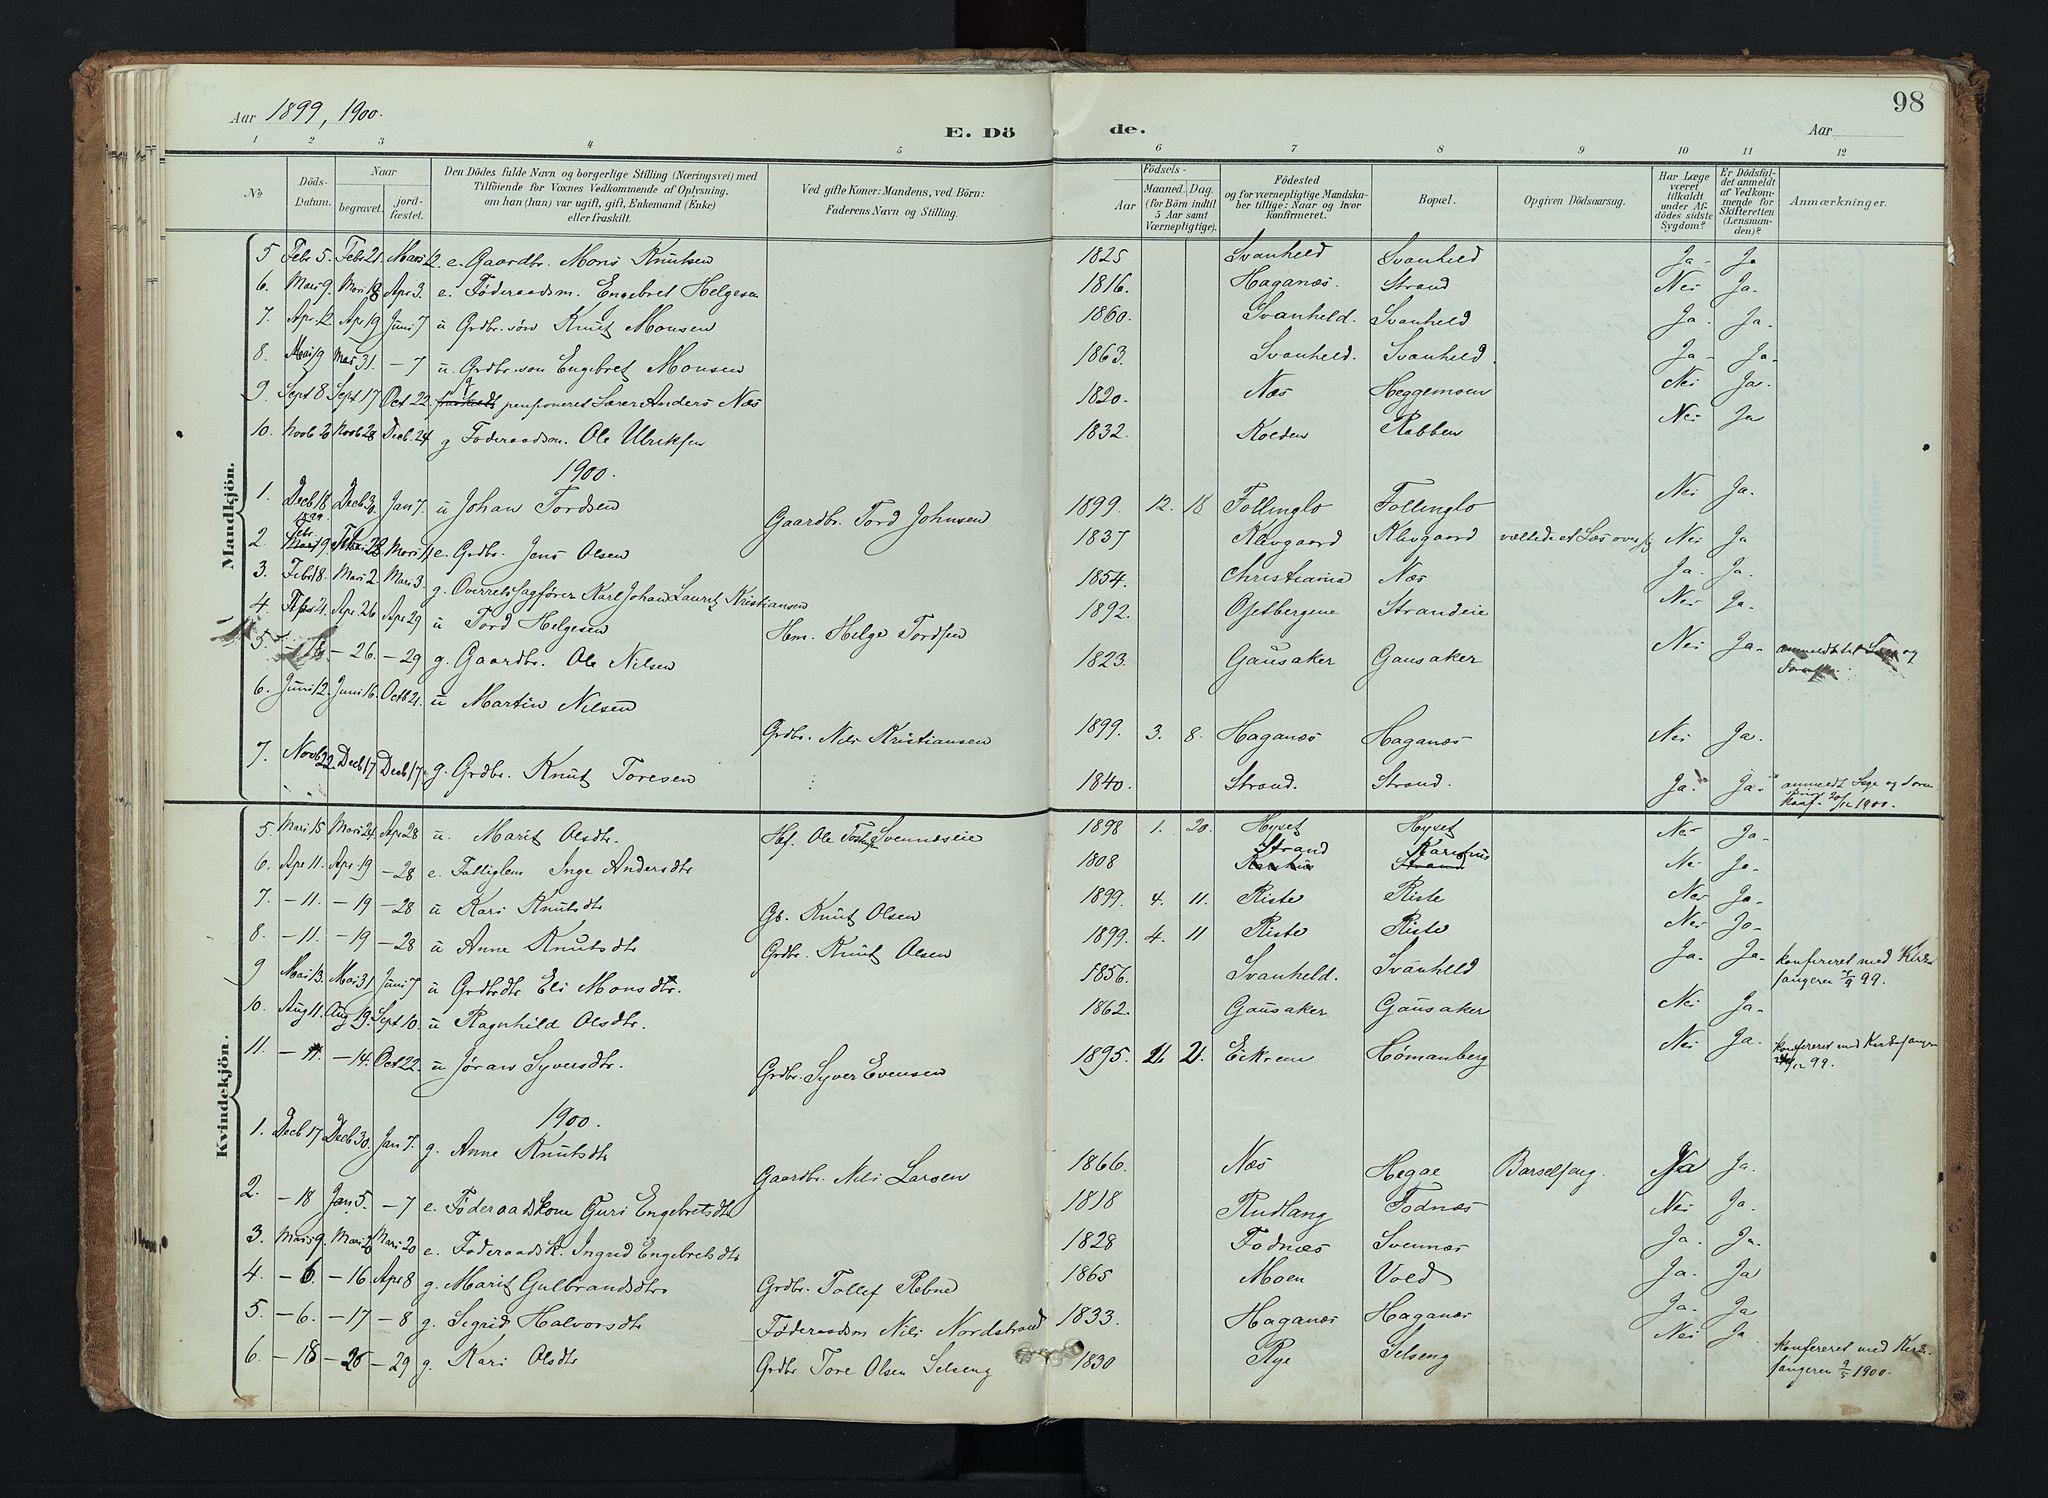 SAH, Nord-Aurdal prestekontor, Ministerialbok nr. 16, 1897-1925, s. 98